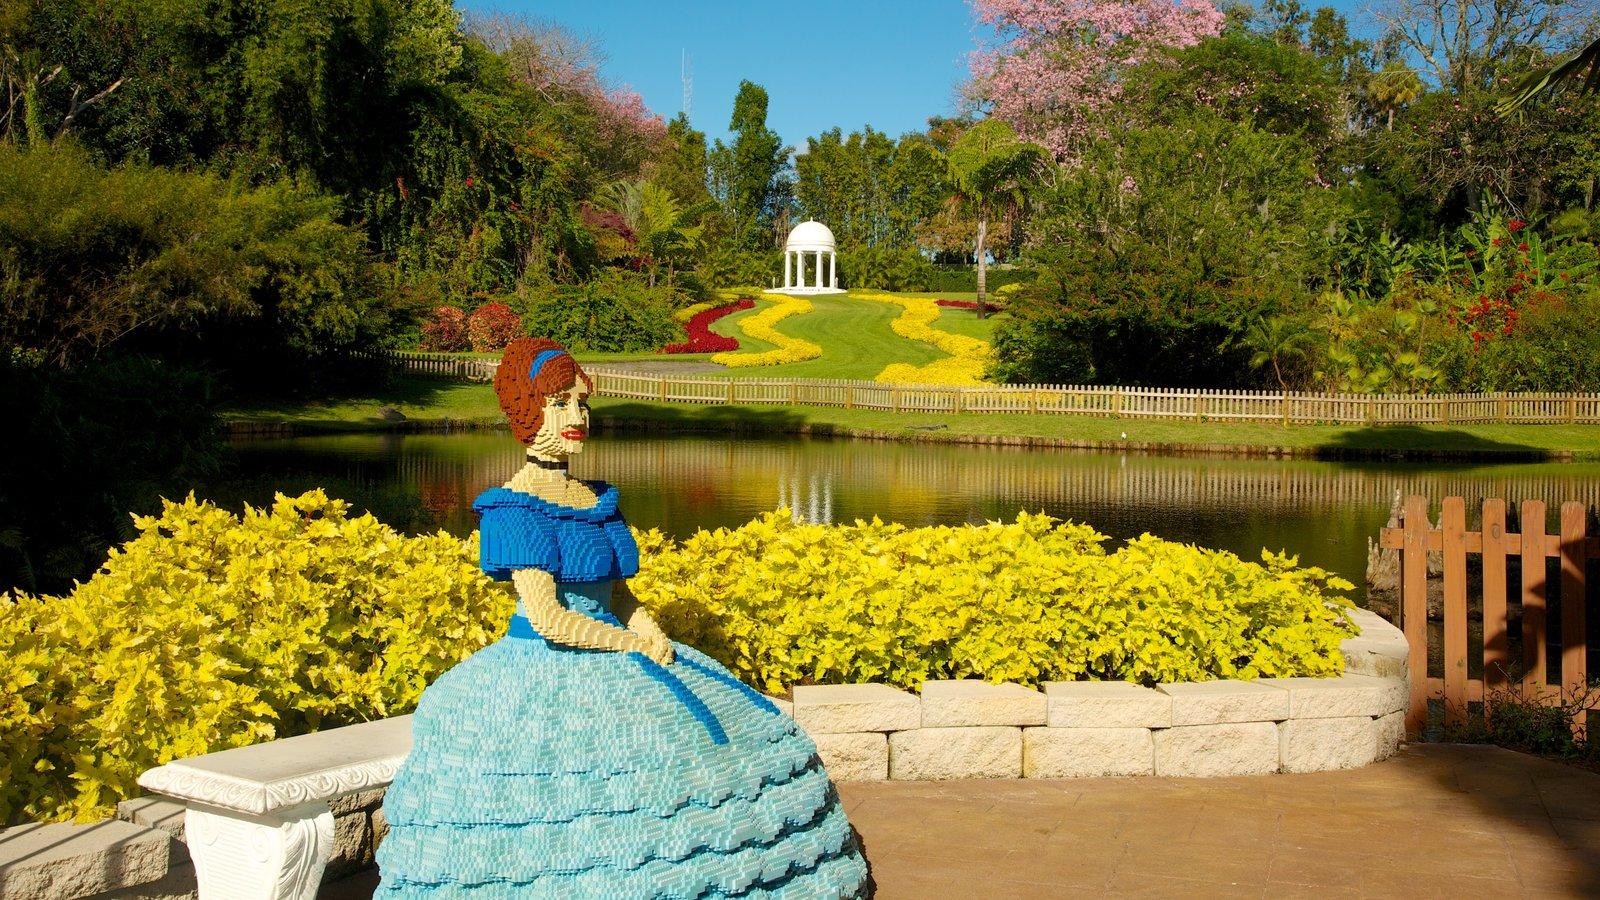 Legoland Florida which includes landscape views, a park and a pond